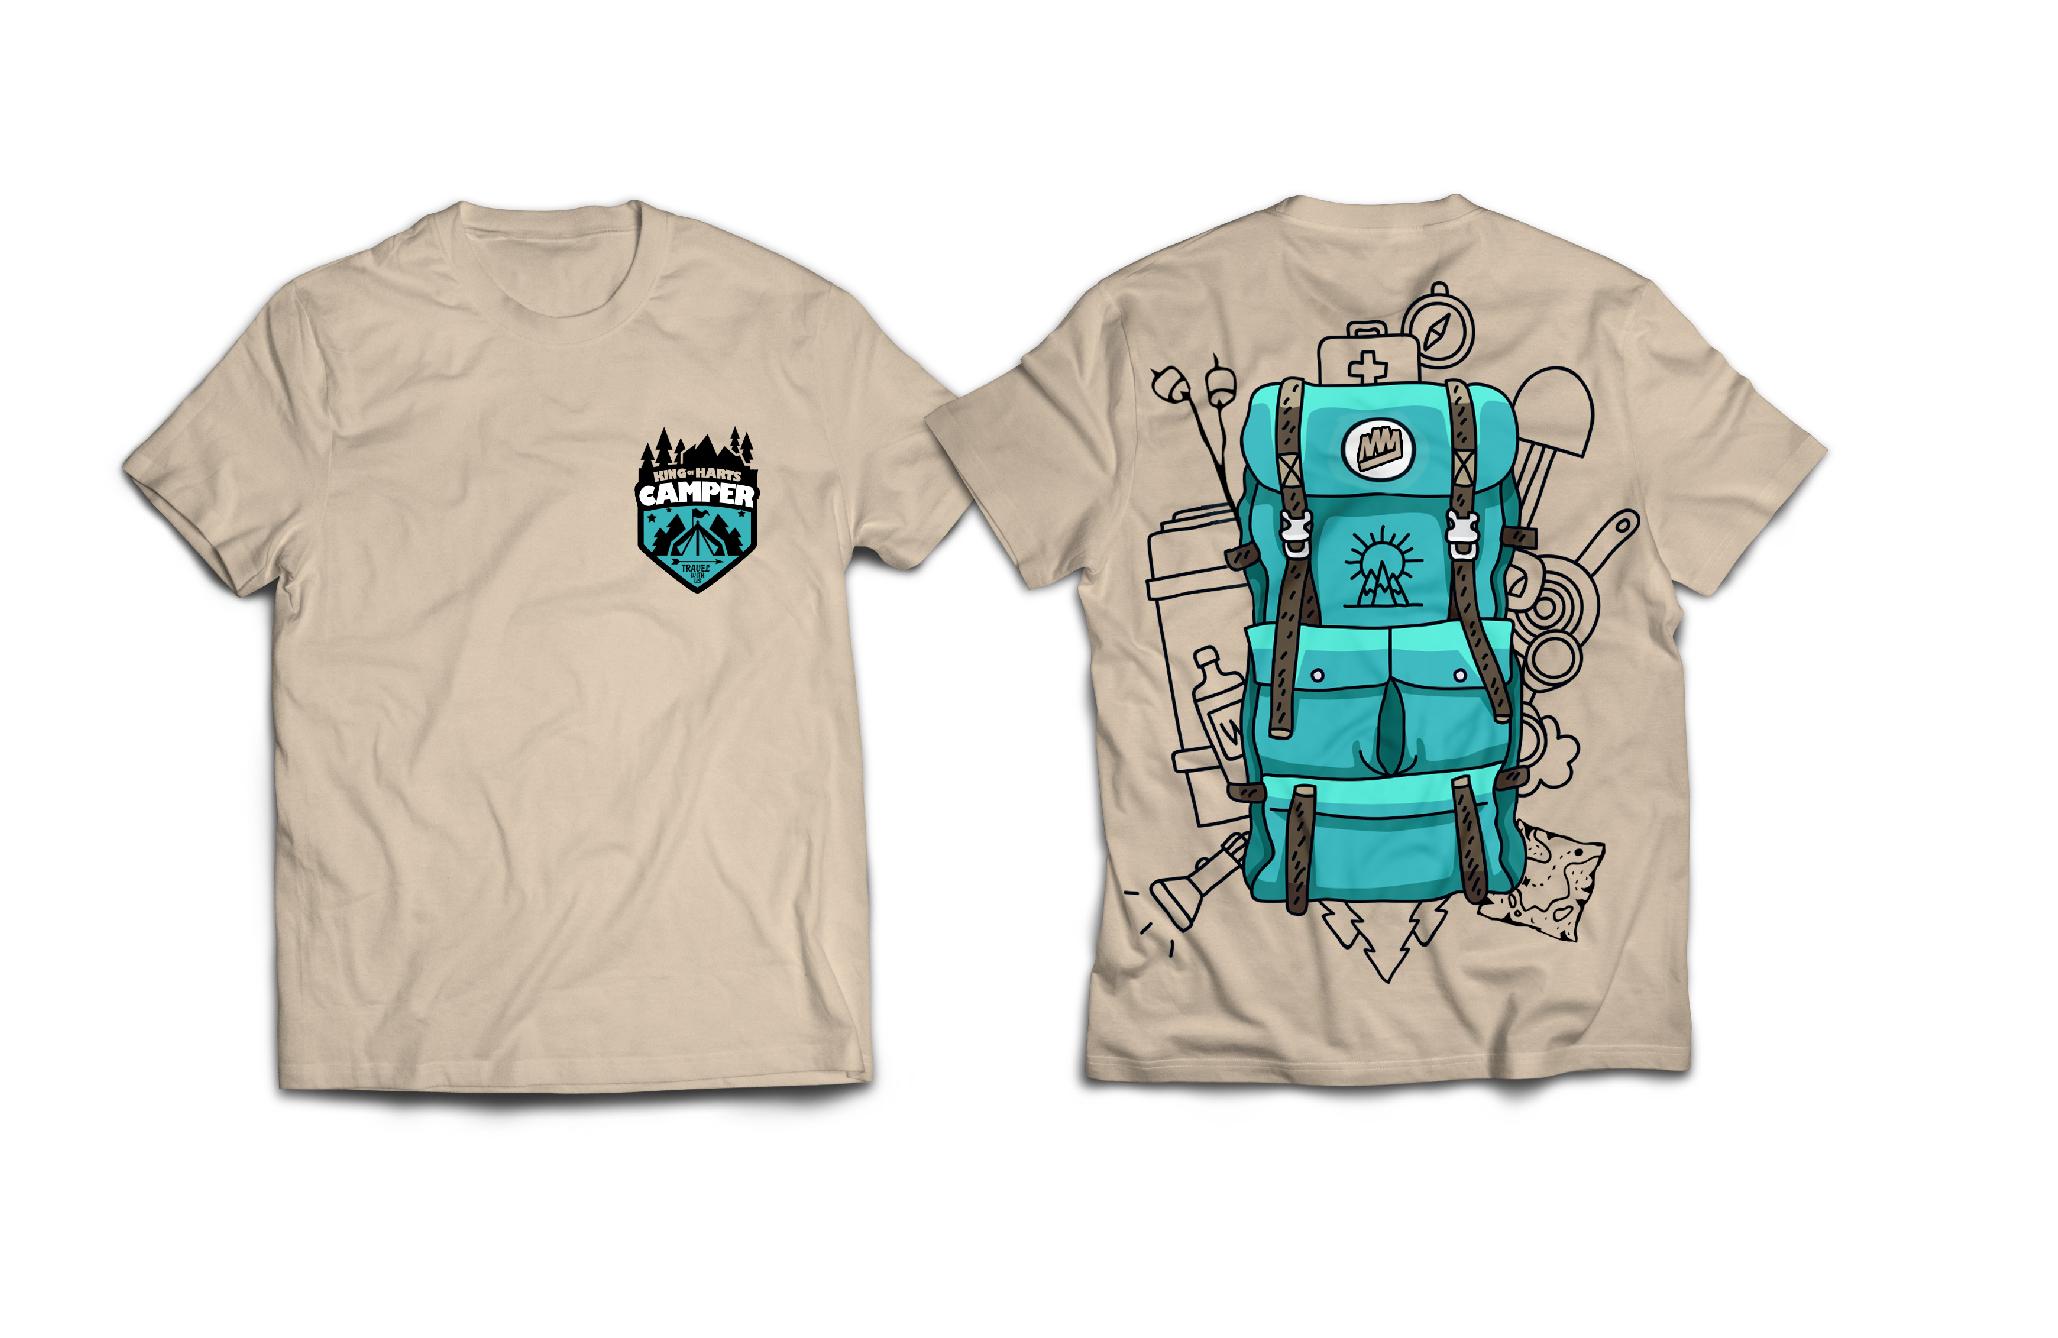 Camper T-Shirt Design - King of Harts - Melissa Joan Hart